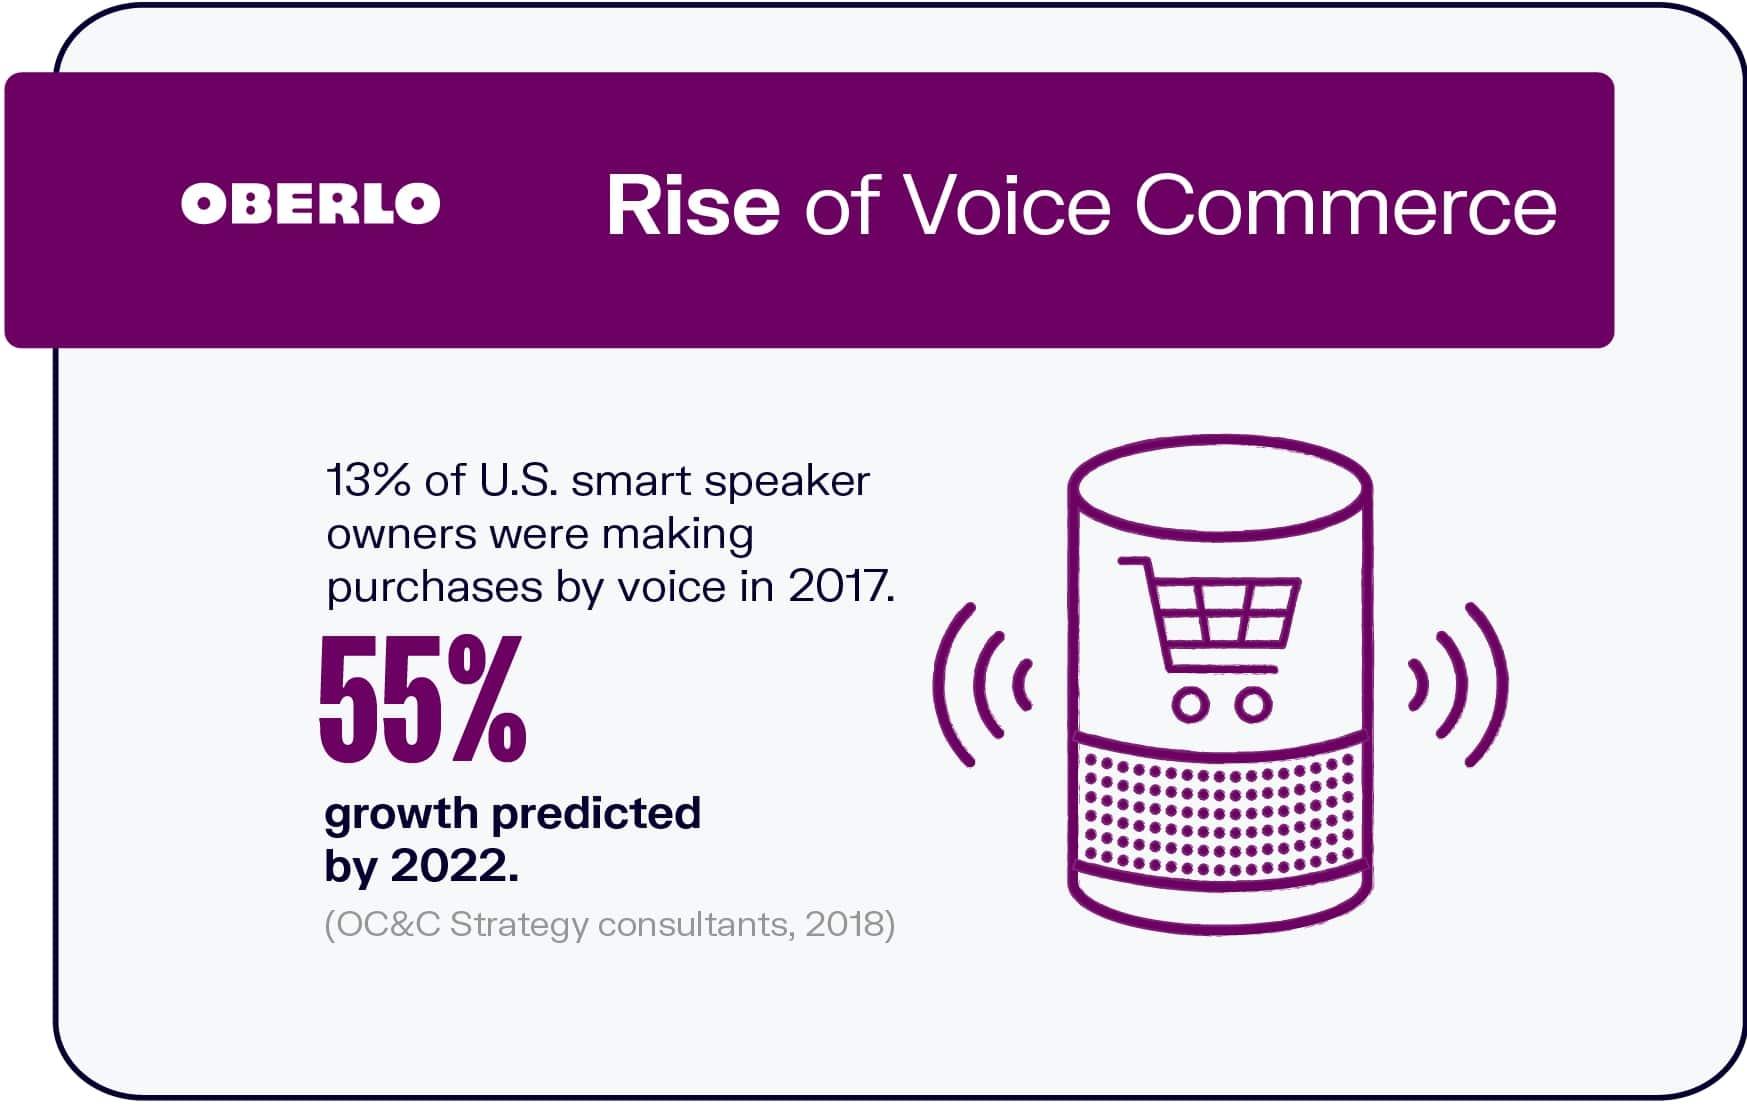 NOBKA 10 ECOMMERCE TRENDS THAT YOU NEED TO KNOW IN 2020 51 بررسی ده روند جذاب تجارت الکترونیک در سال 2020 – بخش اول